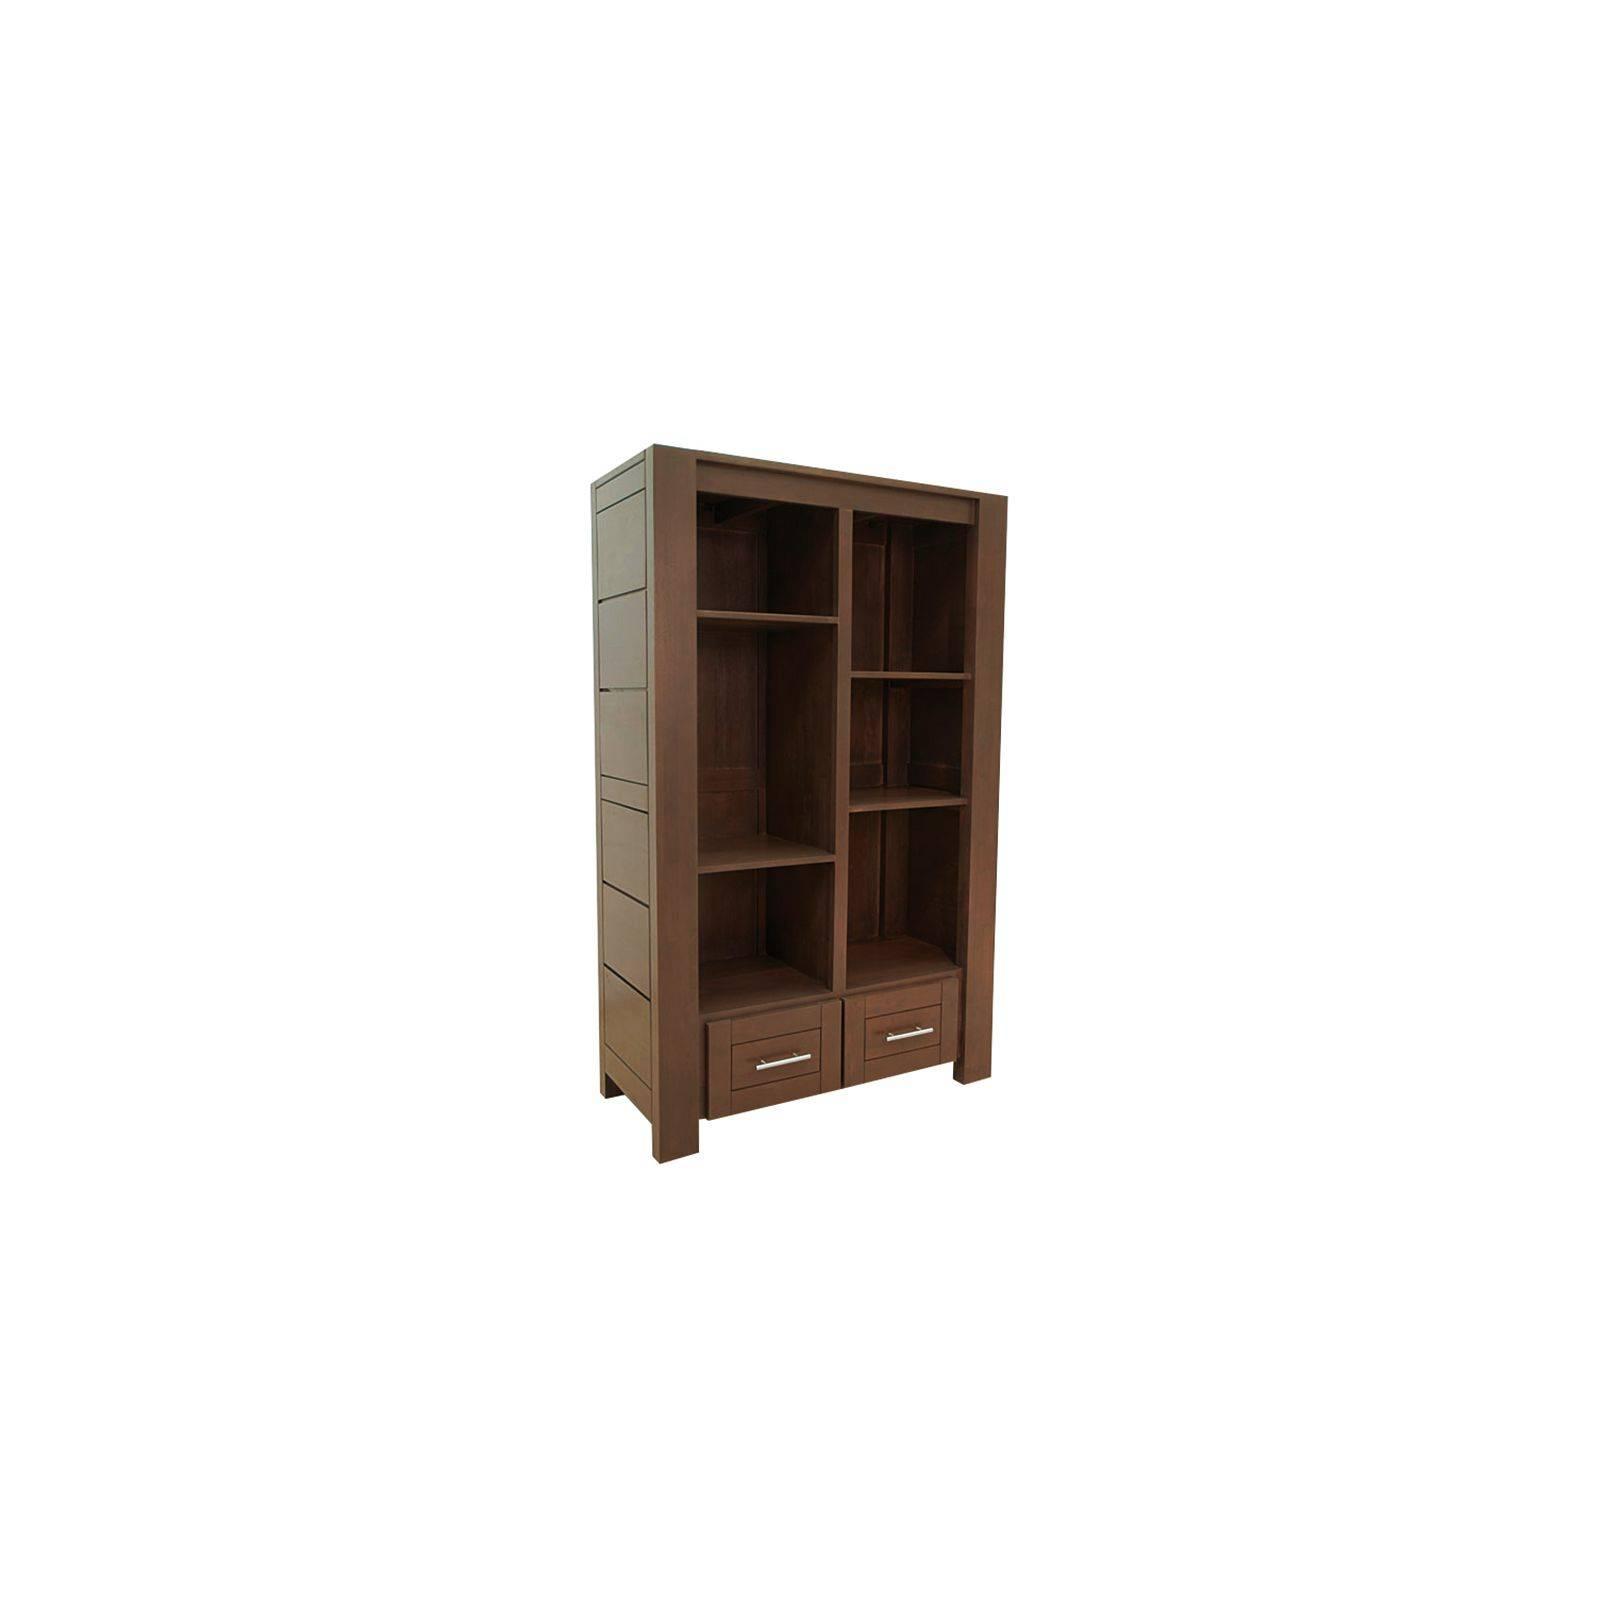 Bibliothèque design en hévéa. mobilier contemporain de la gamme Moka